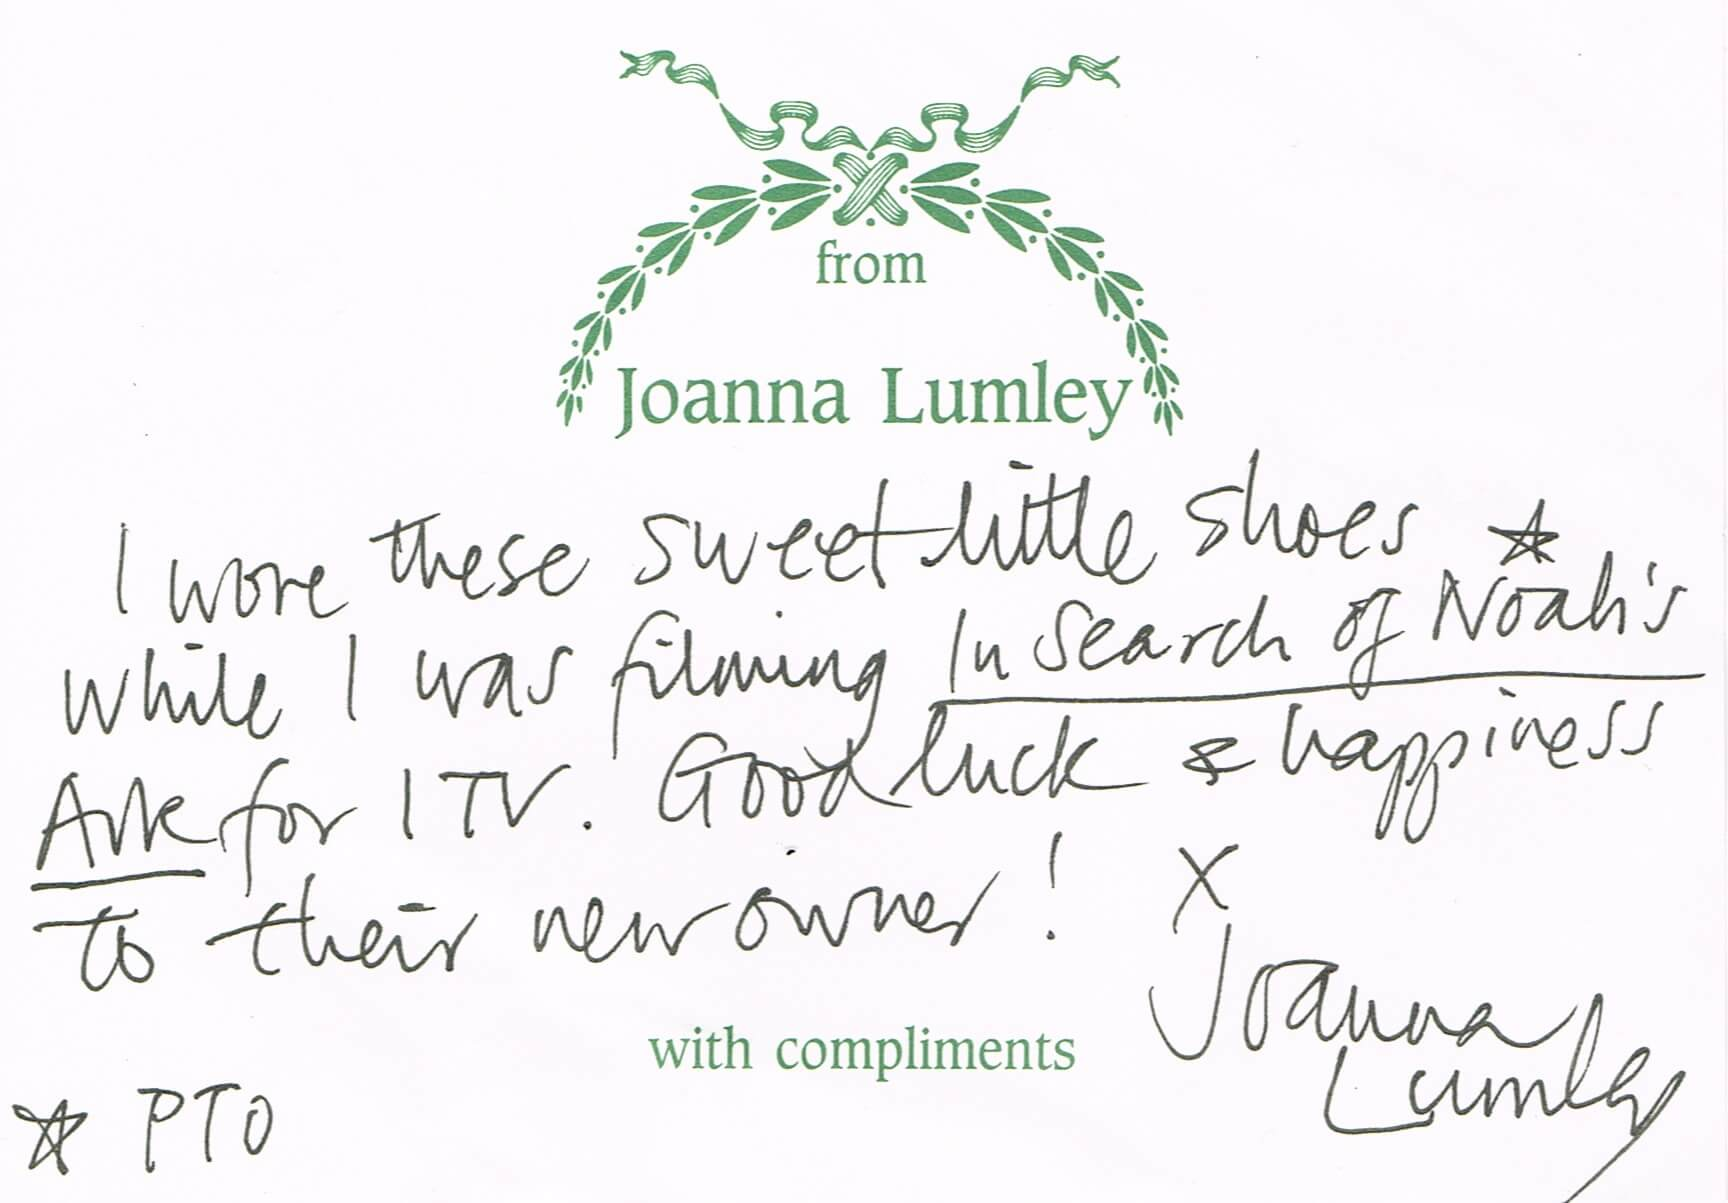 Joanna's hand written note.